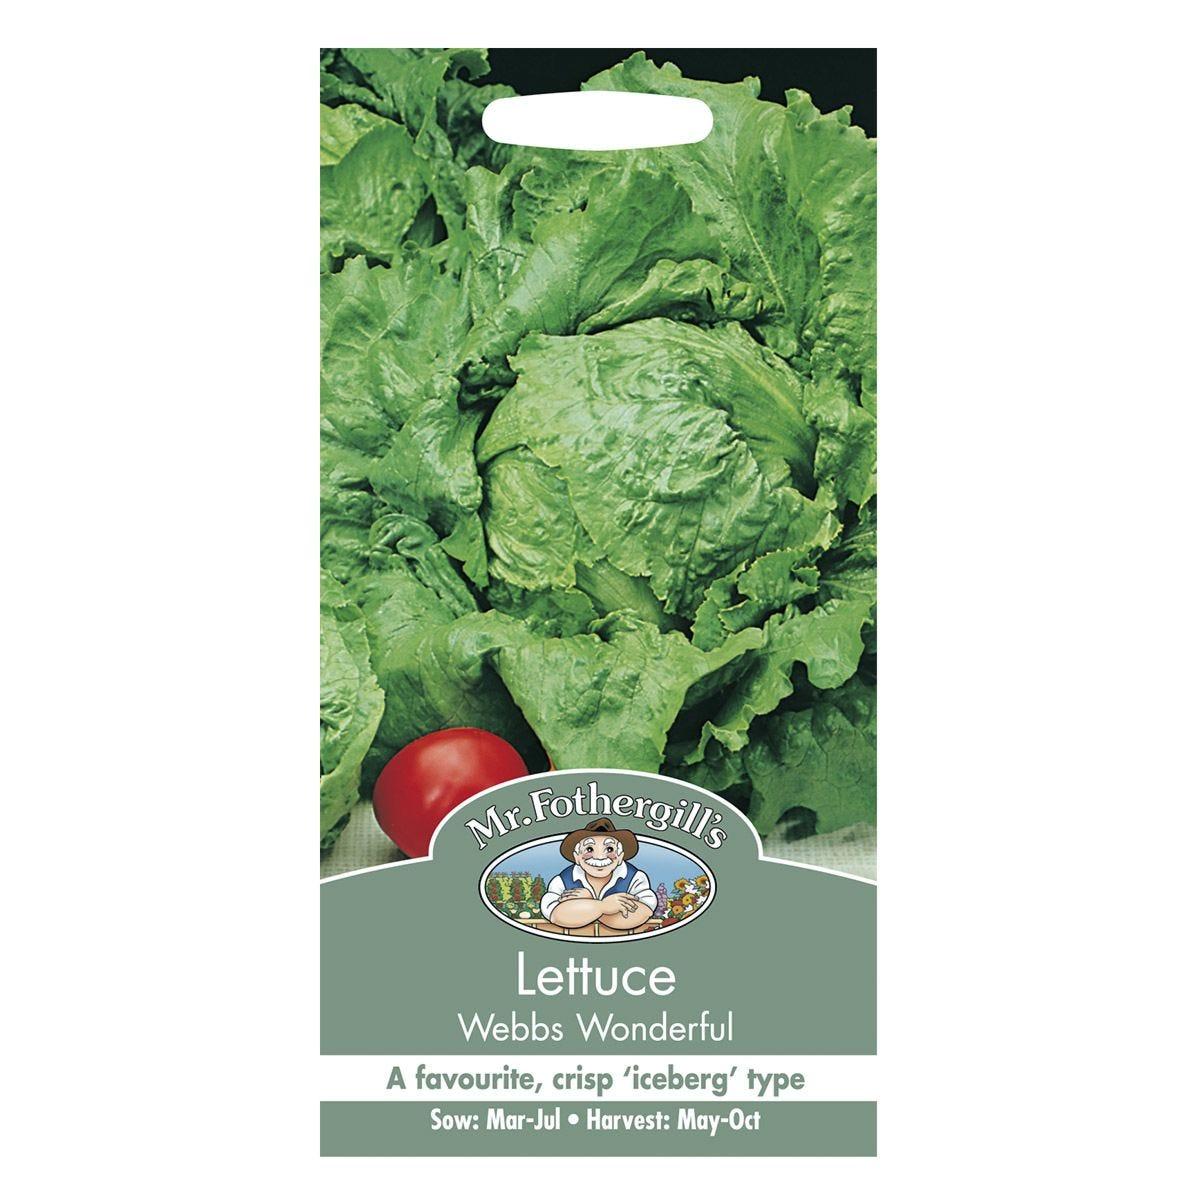 Mr Fothergill's Lettuce Webbs Wonderful Seeds